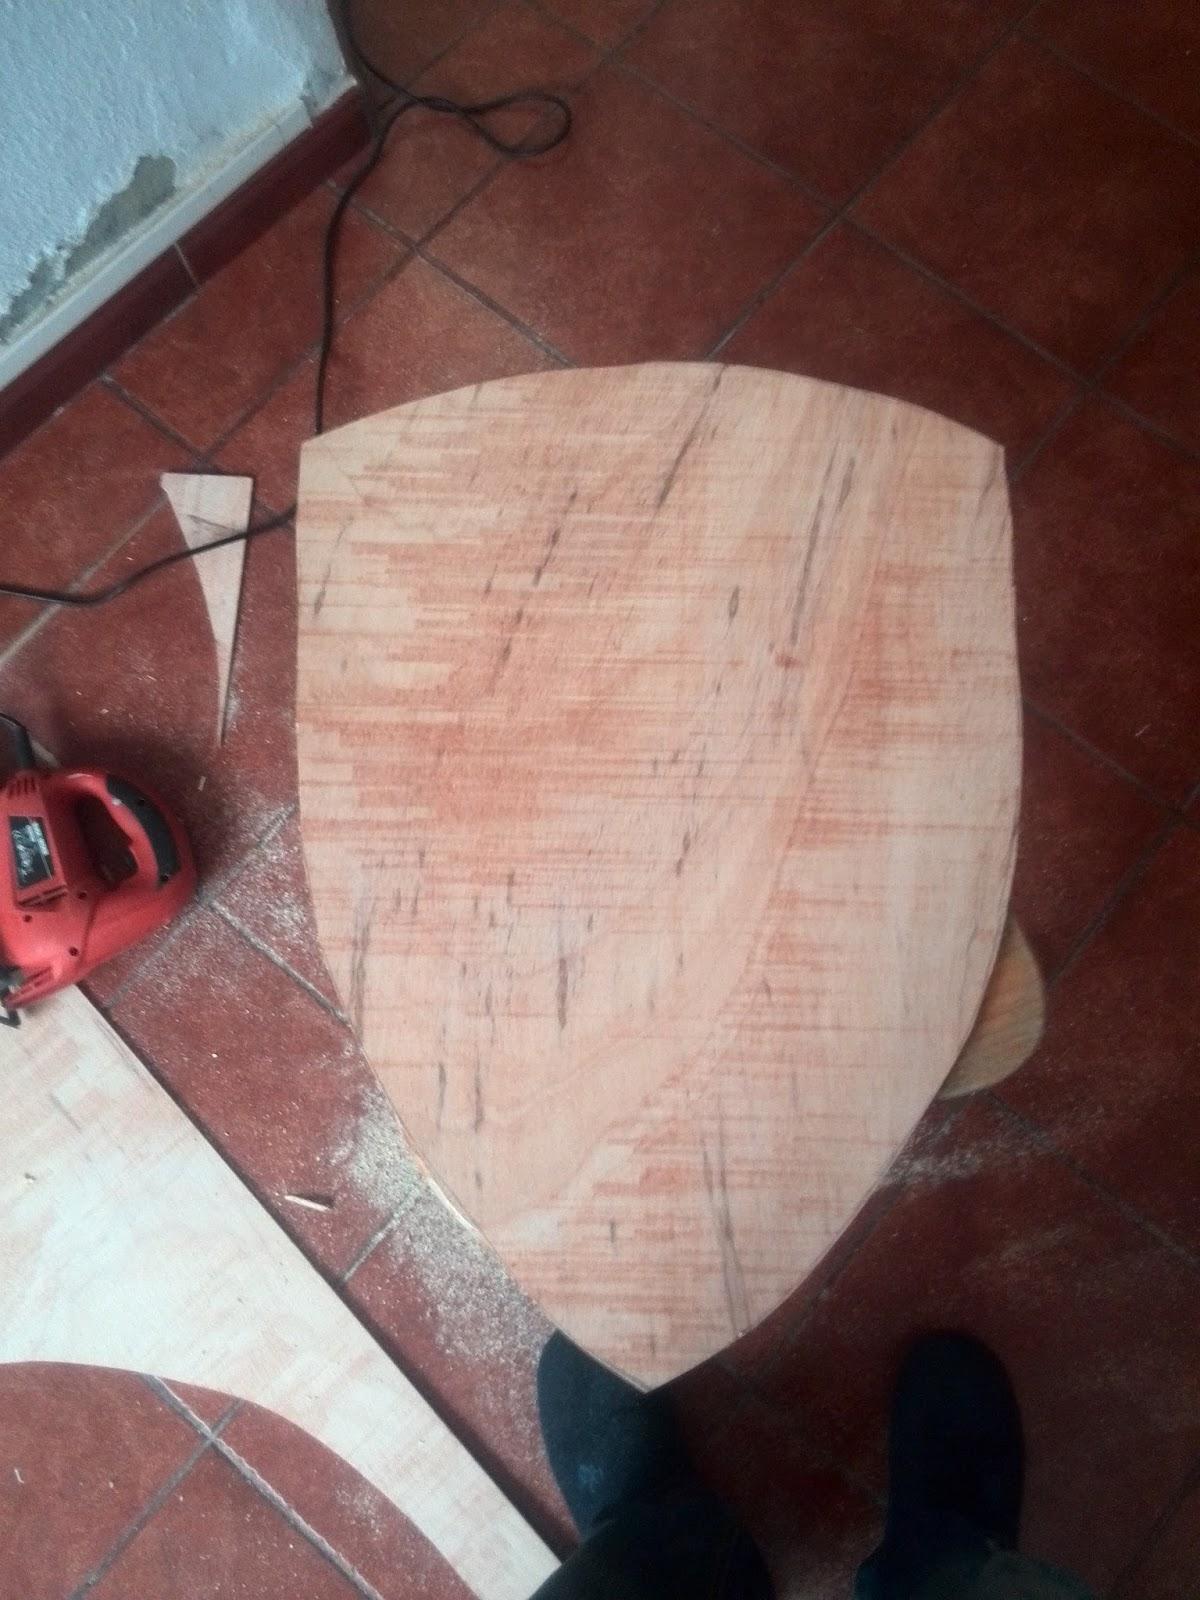 plano de la forma del escudo se cortó en una chapa de madera fina #93383E 1200x1600